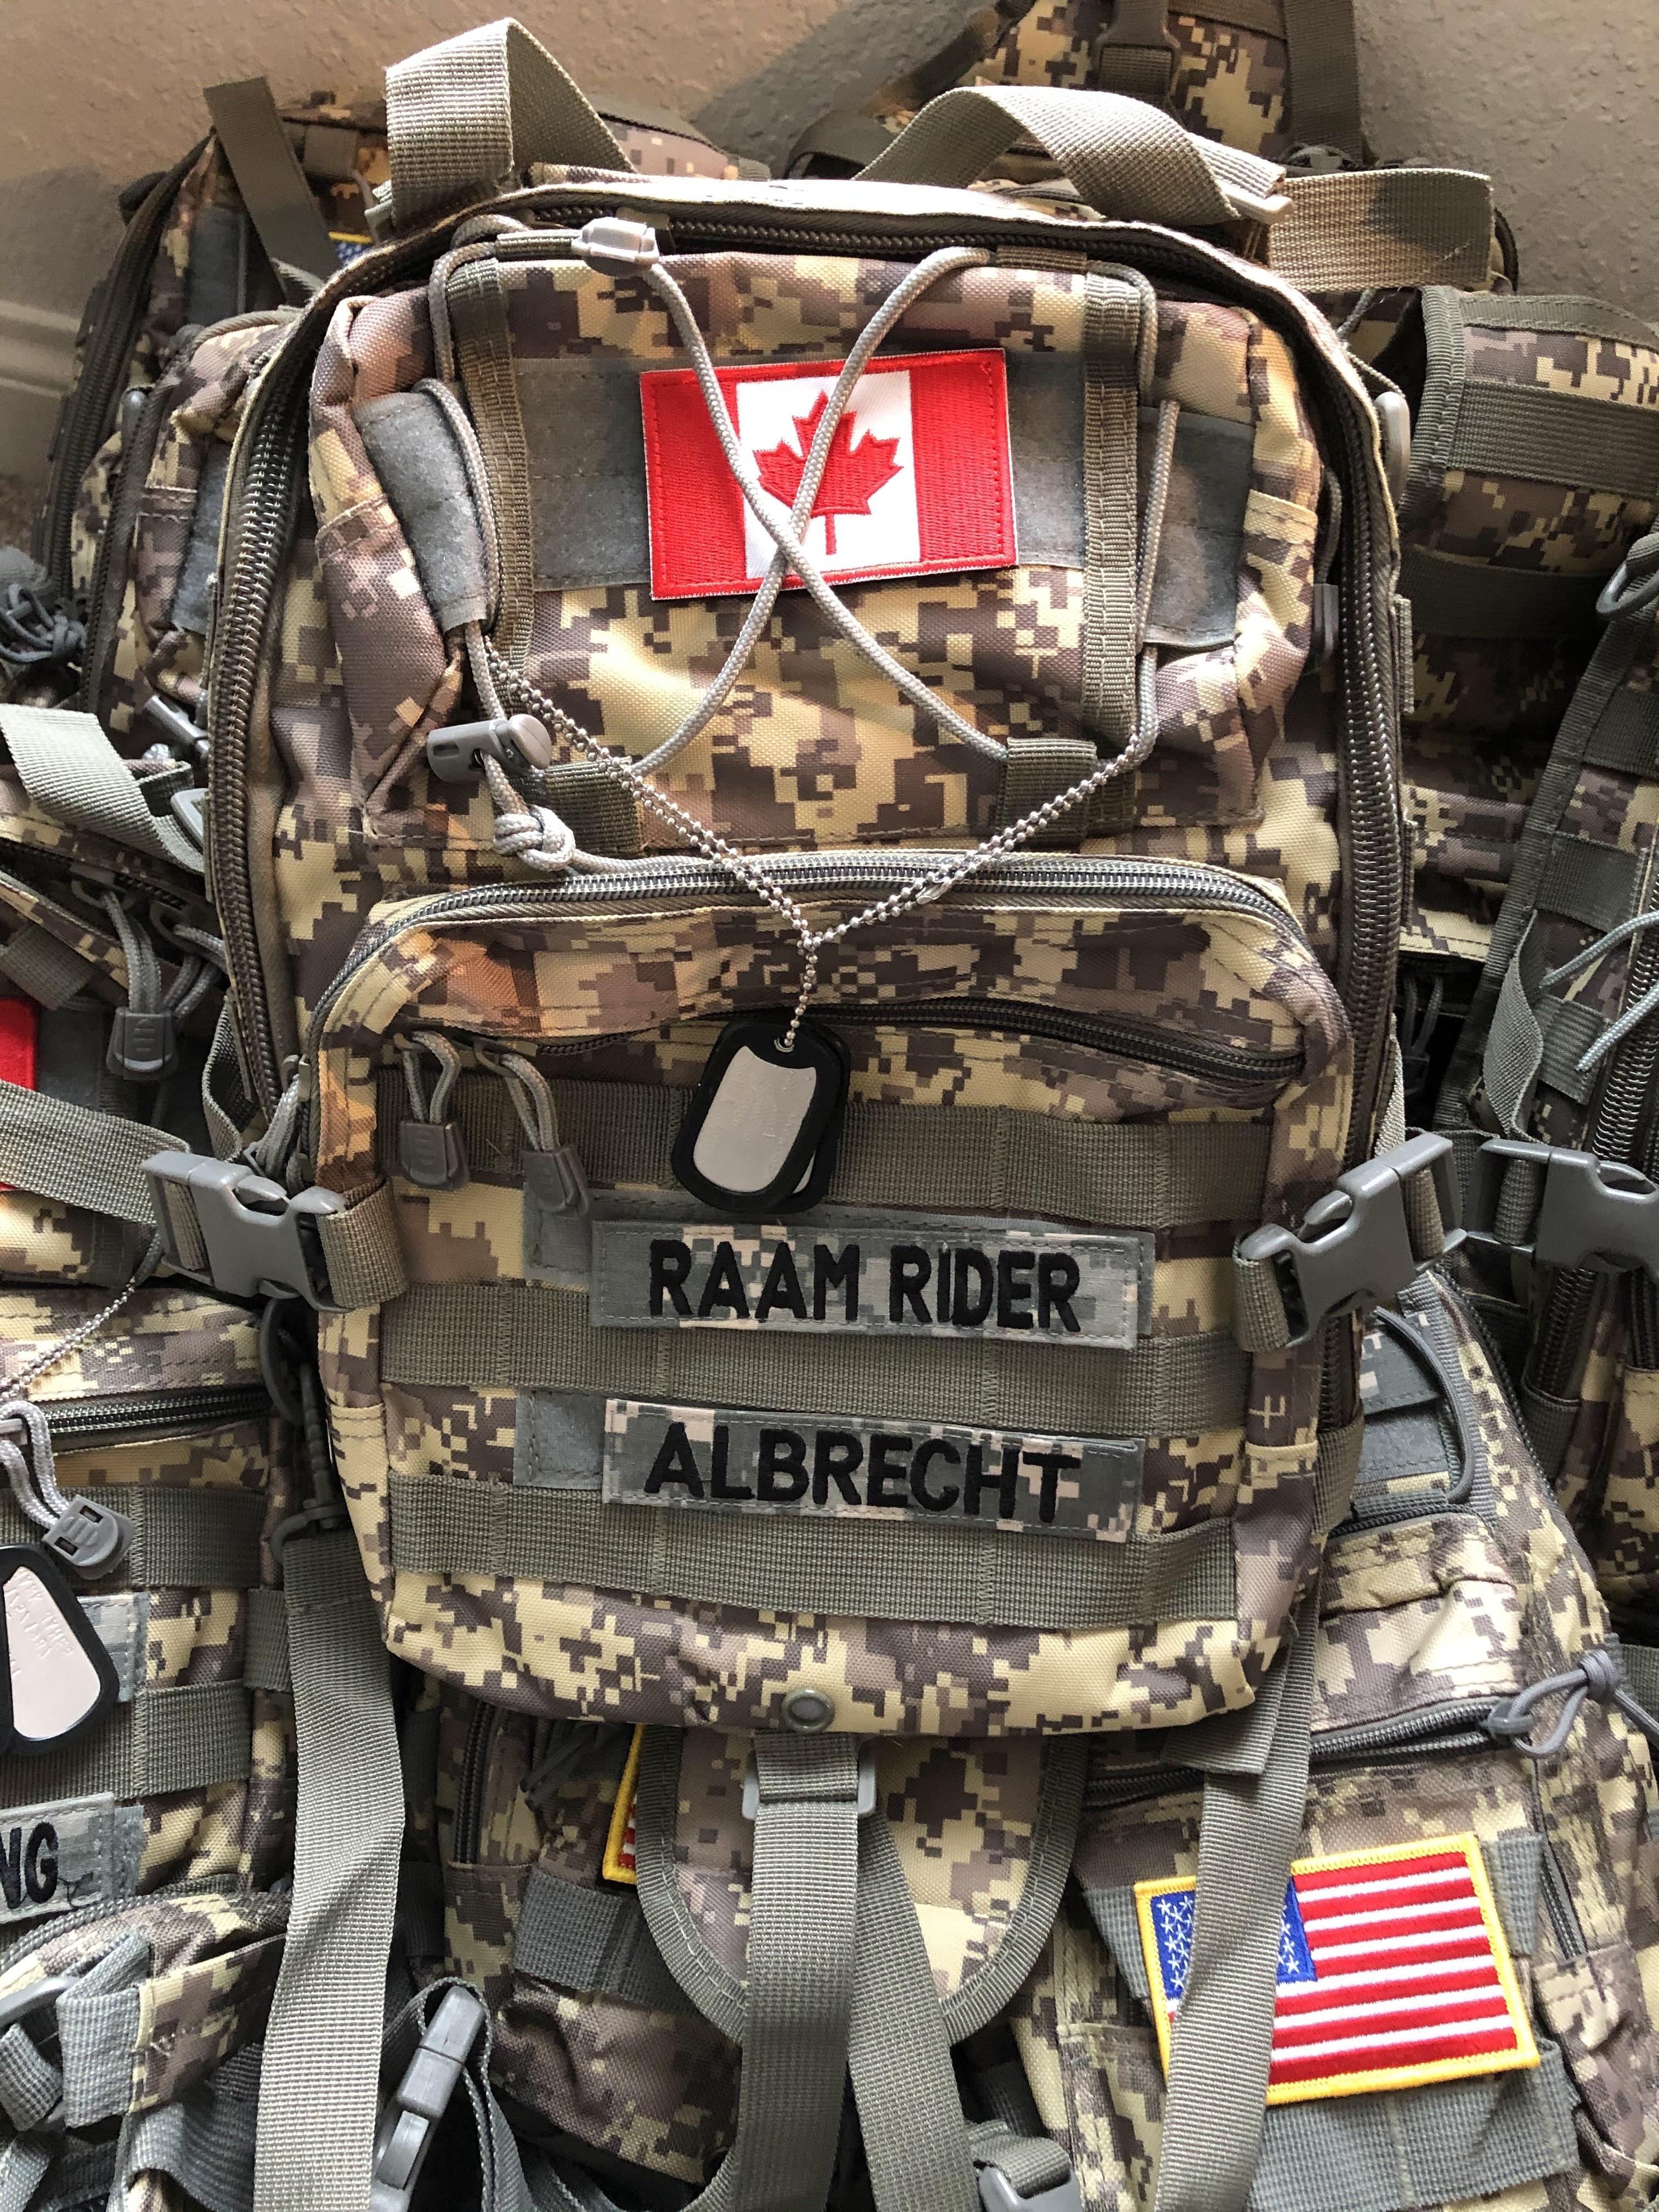 Lex Albrecht's Race Across America custom army backpack